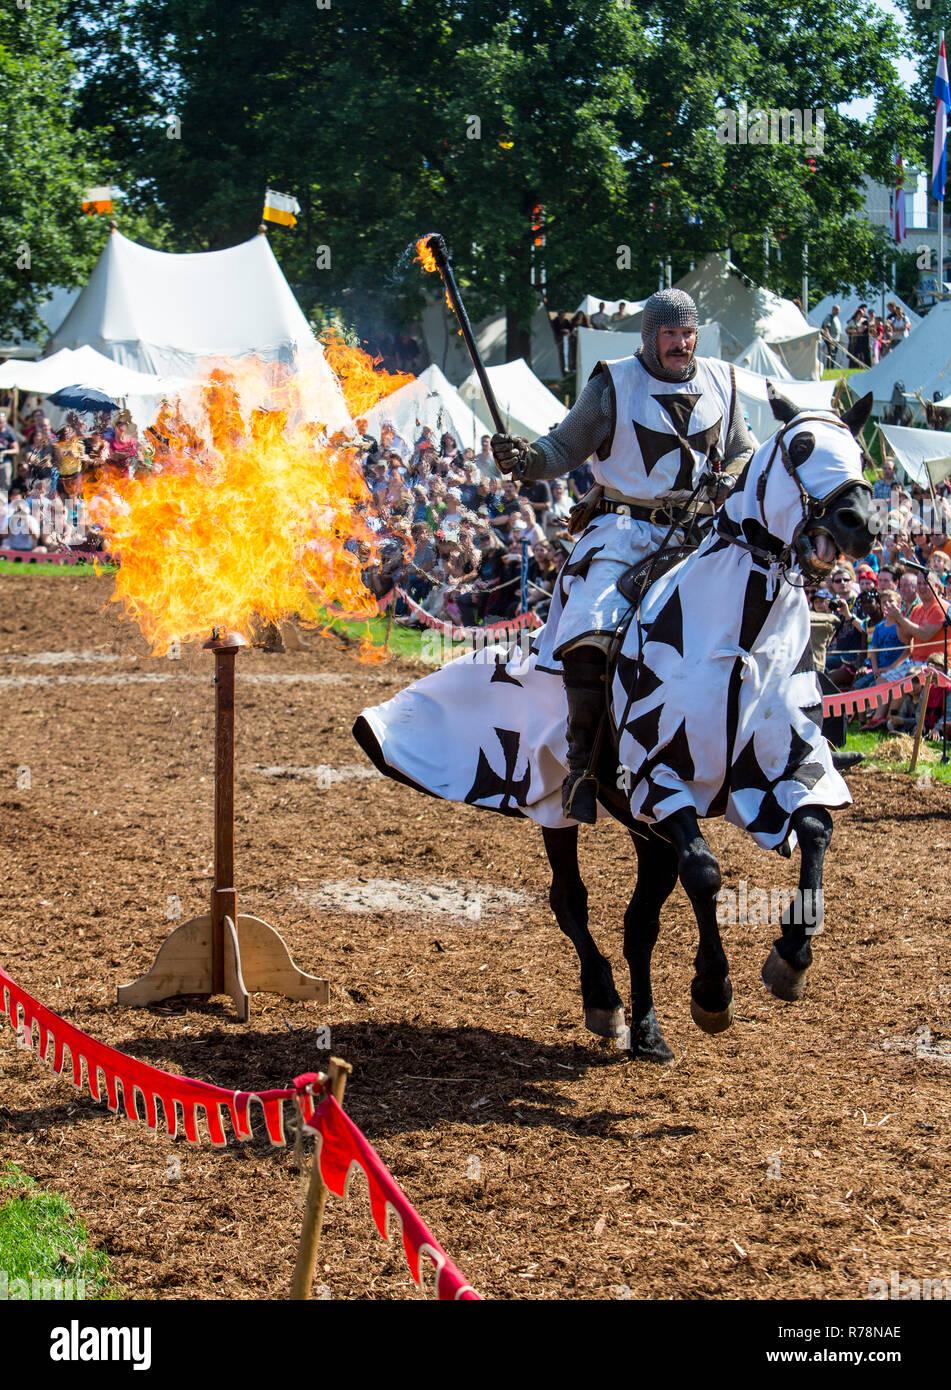 Medieval spectacle, joust, at Broich castle, Mülheim an der Ruhr, North Rhine-Westphalia Castle, Germany - Stock Image